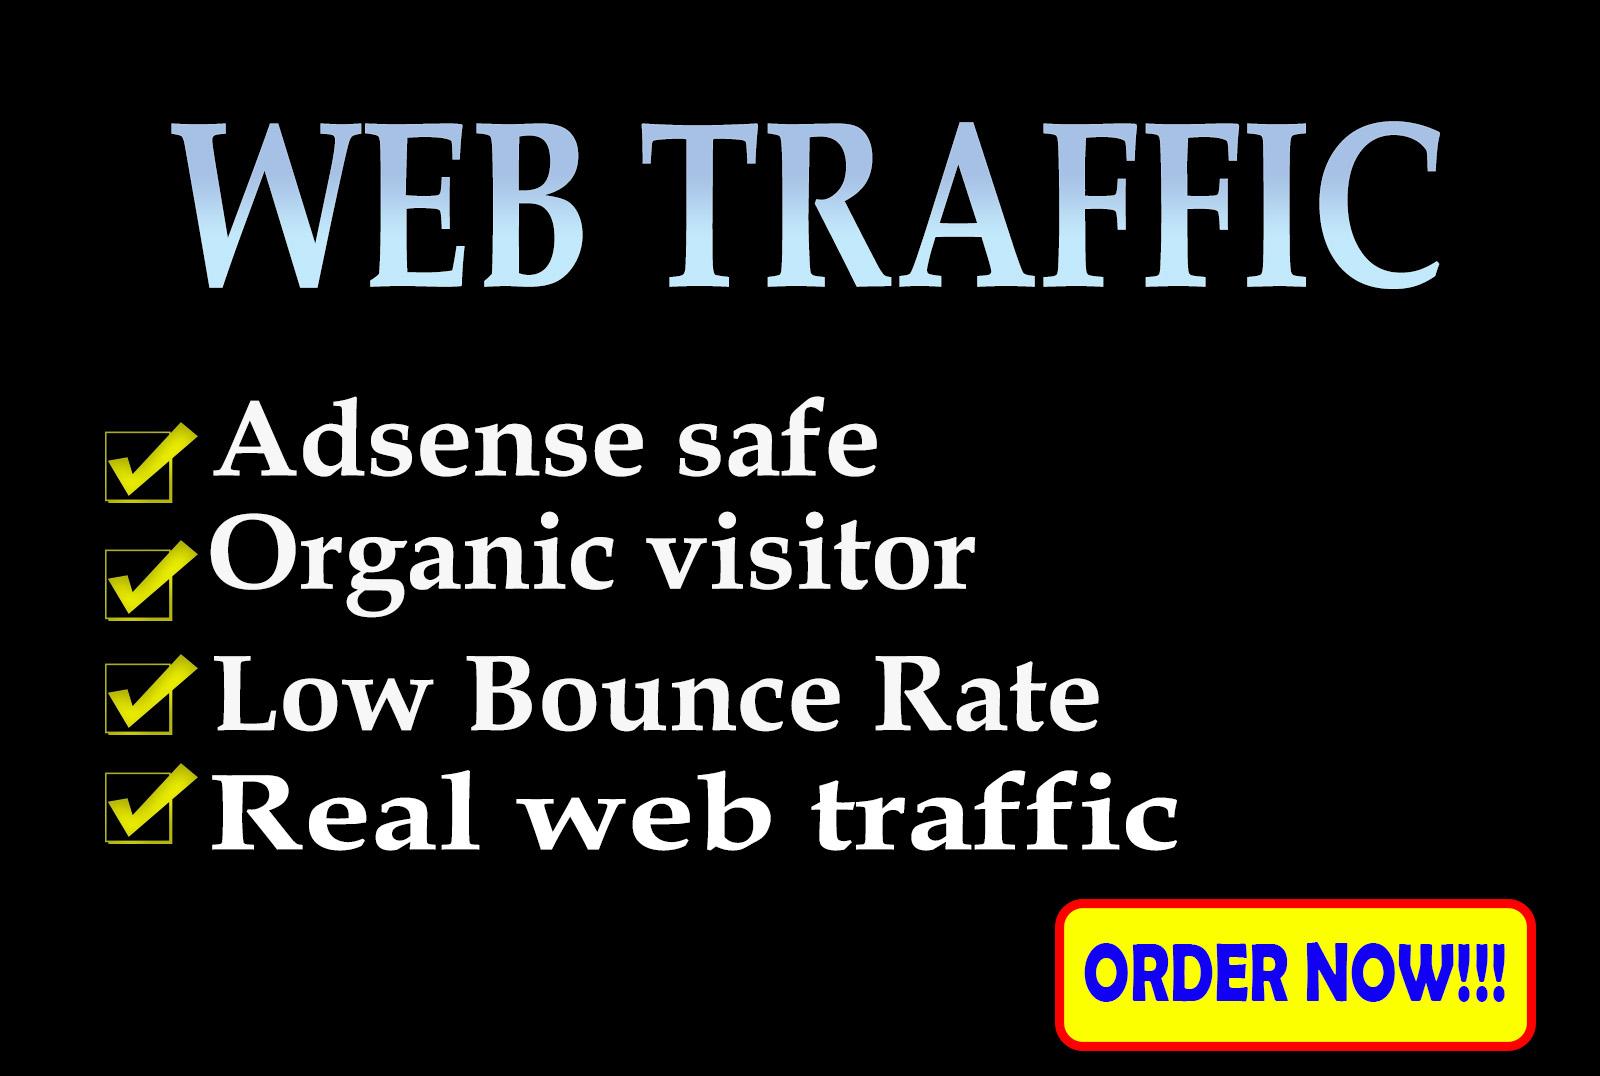 I will bring real organic web traffic